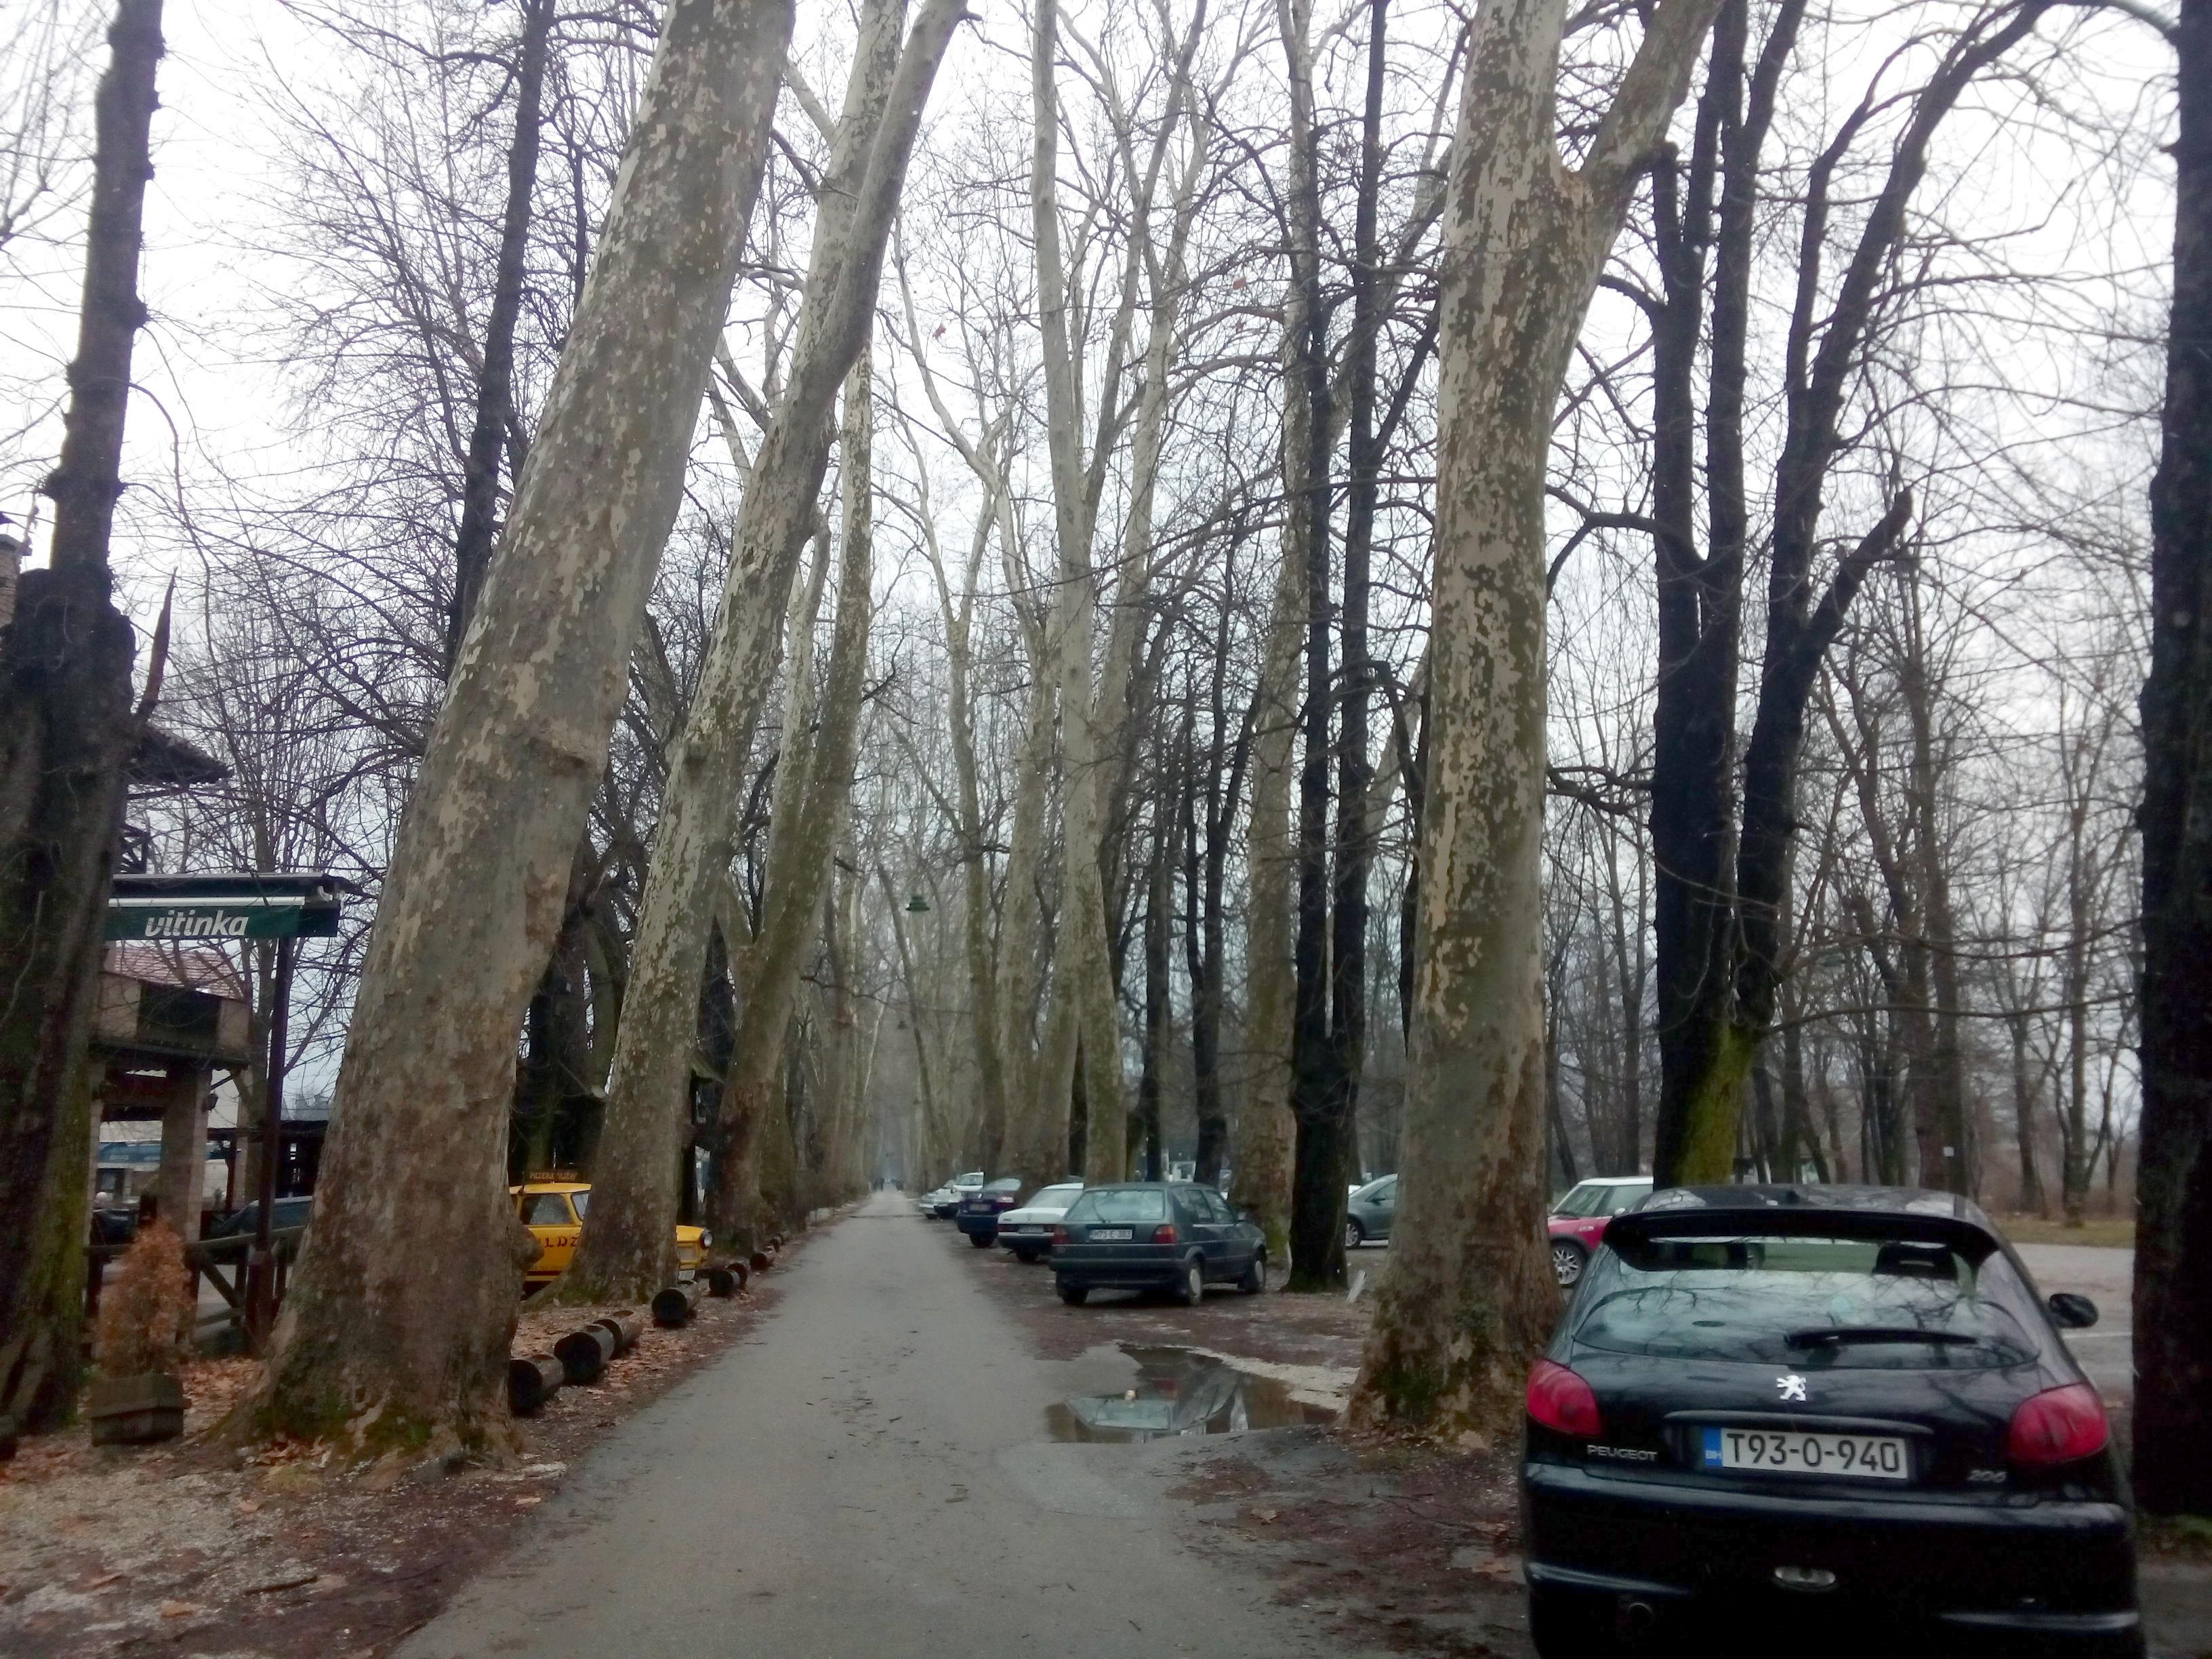 https://i.amy.gy/2017-sarajevo/IMG_20180204_140833.jpg